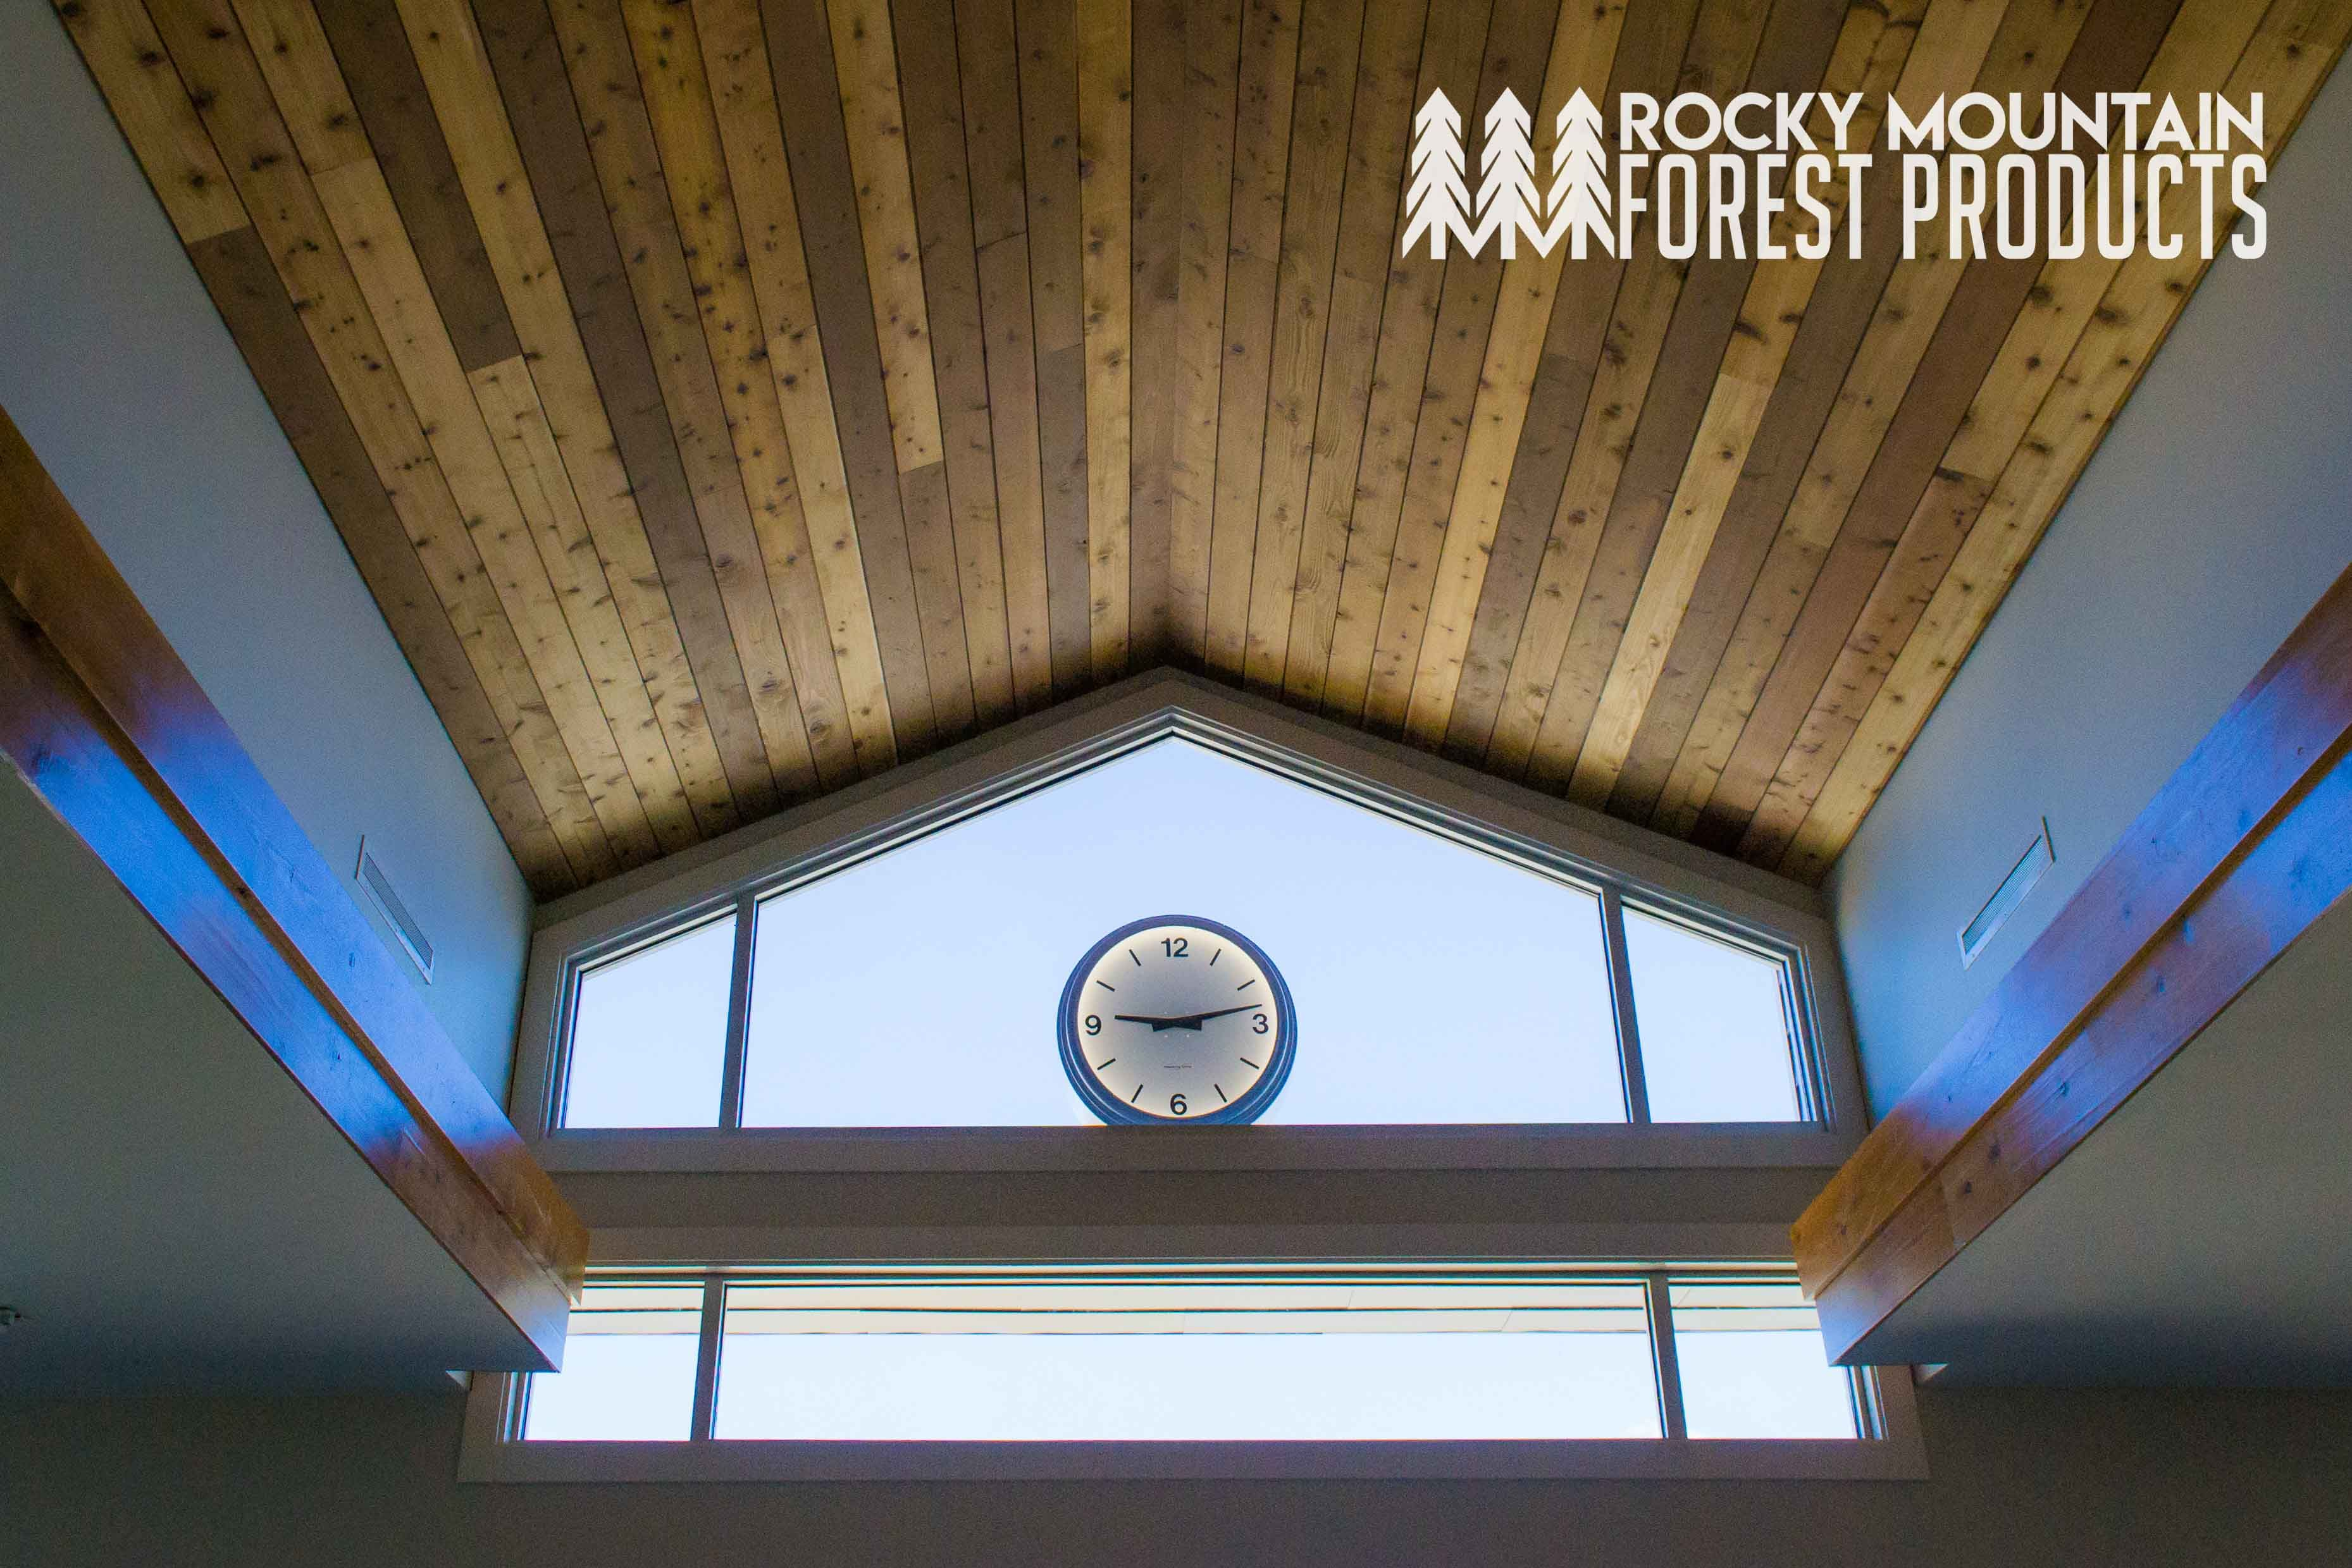 Denver Wooden Siding Materials Cedar Siding Supplies Cedar Siding Siding Clapboard